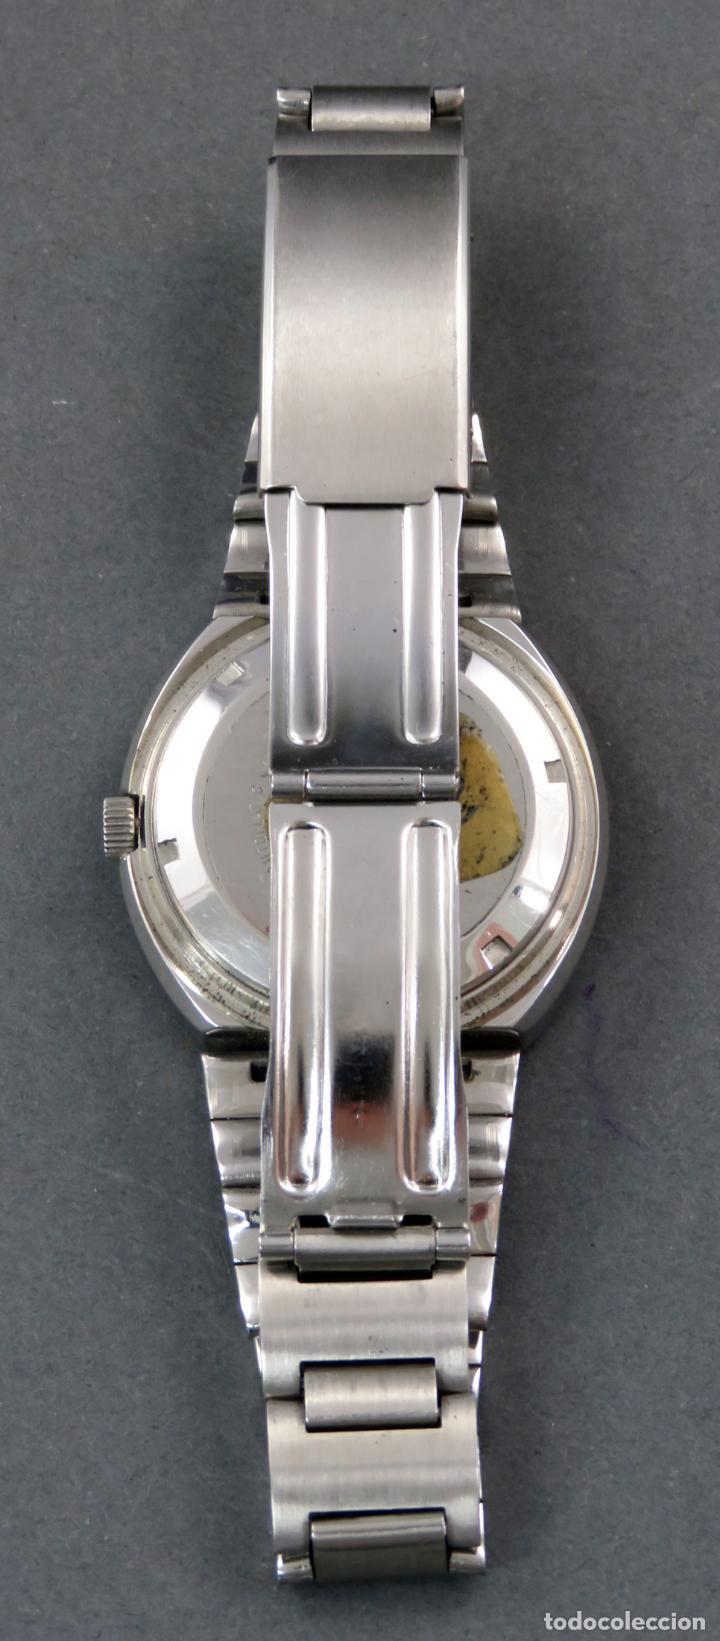 Relojes automáticos: Reloj automático Vanroy Automatic 25 jewels Incabloc Swiss Made Funciona - Foto 3 - 143168578